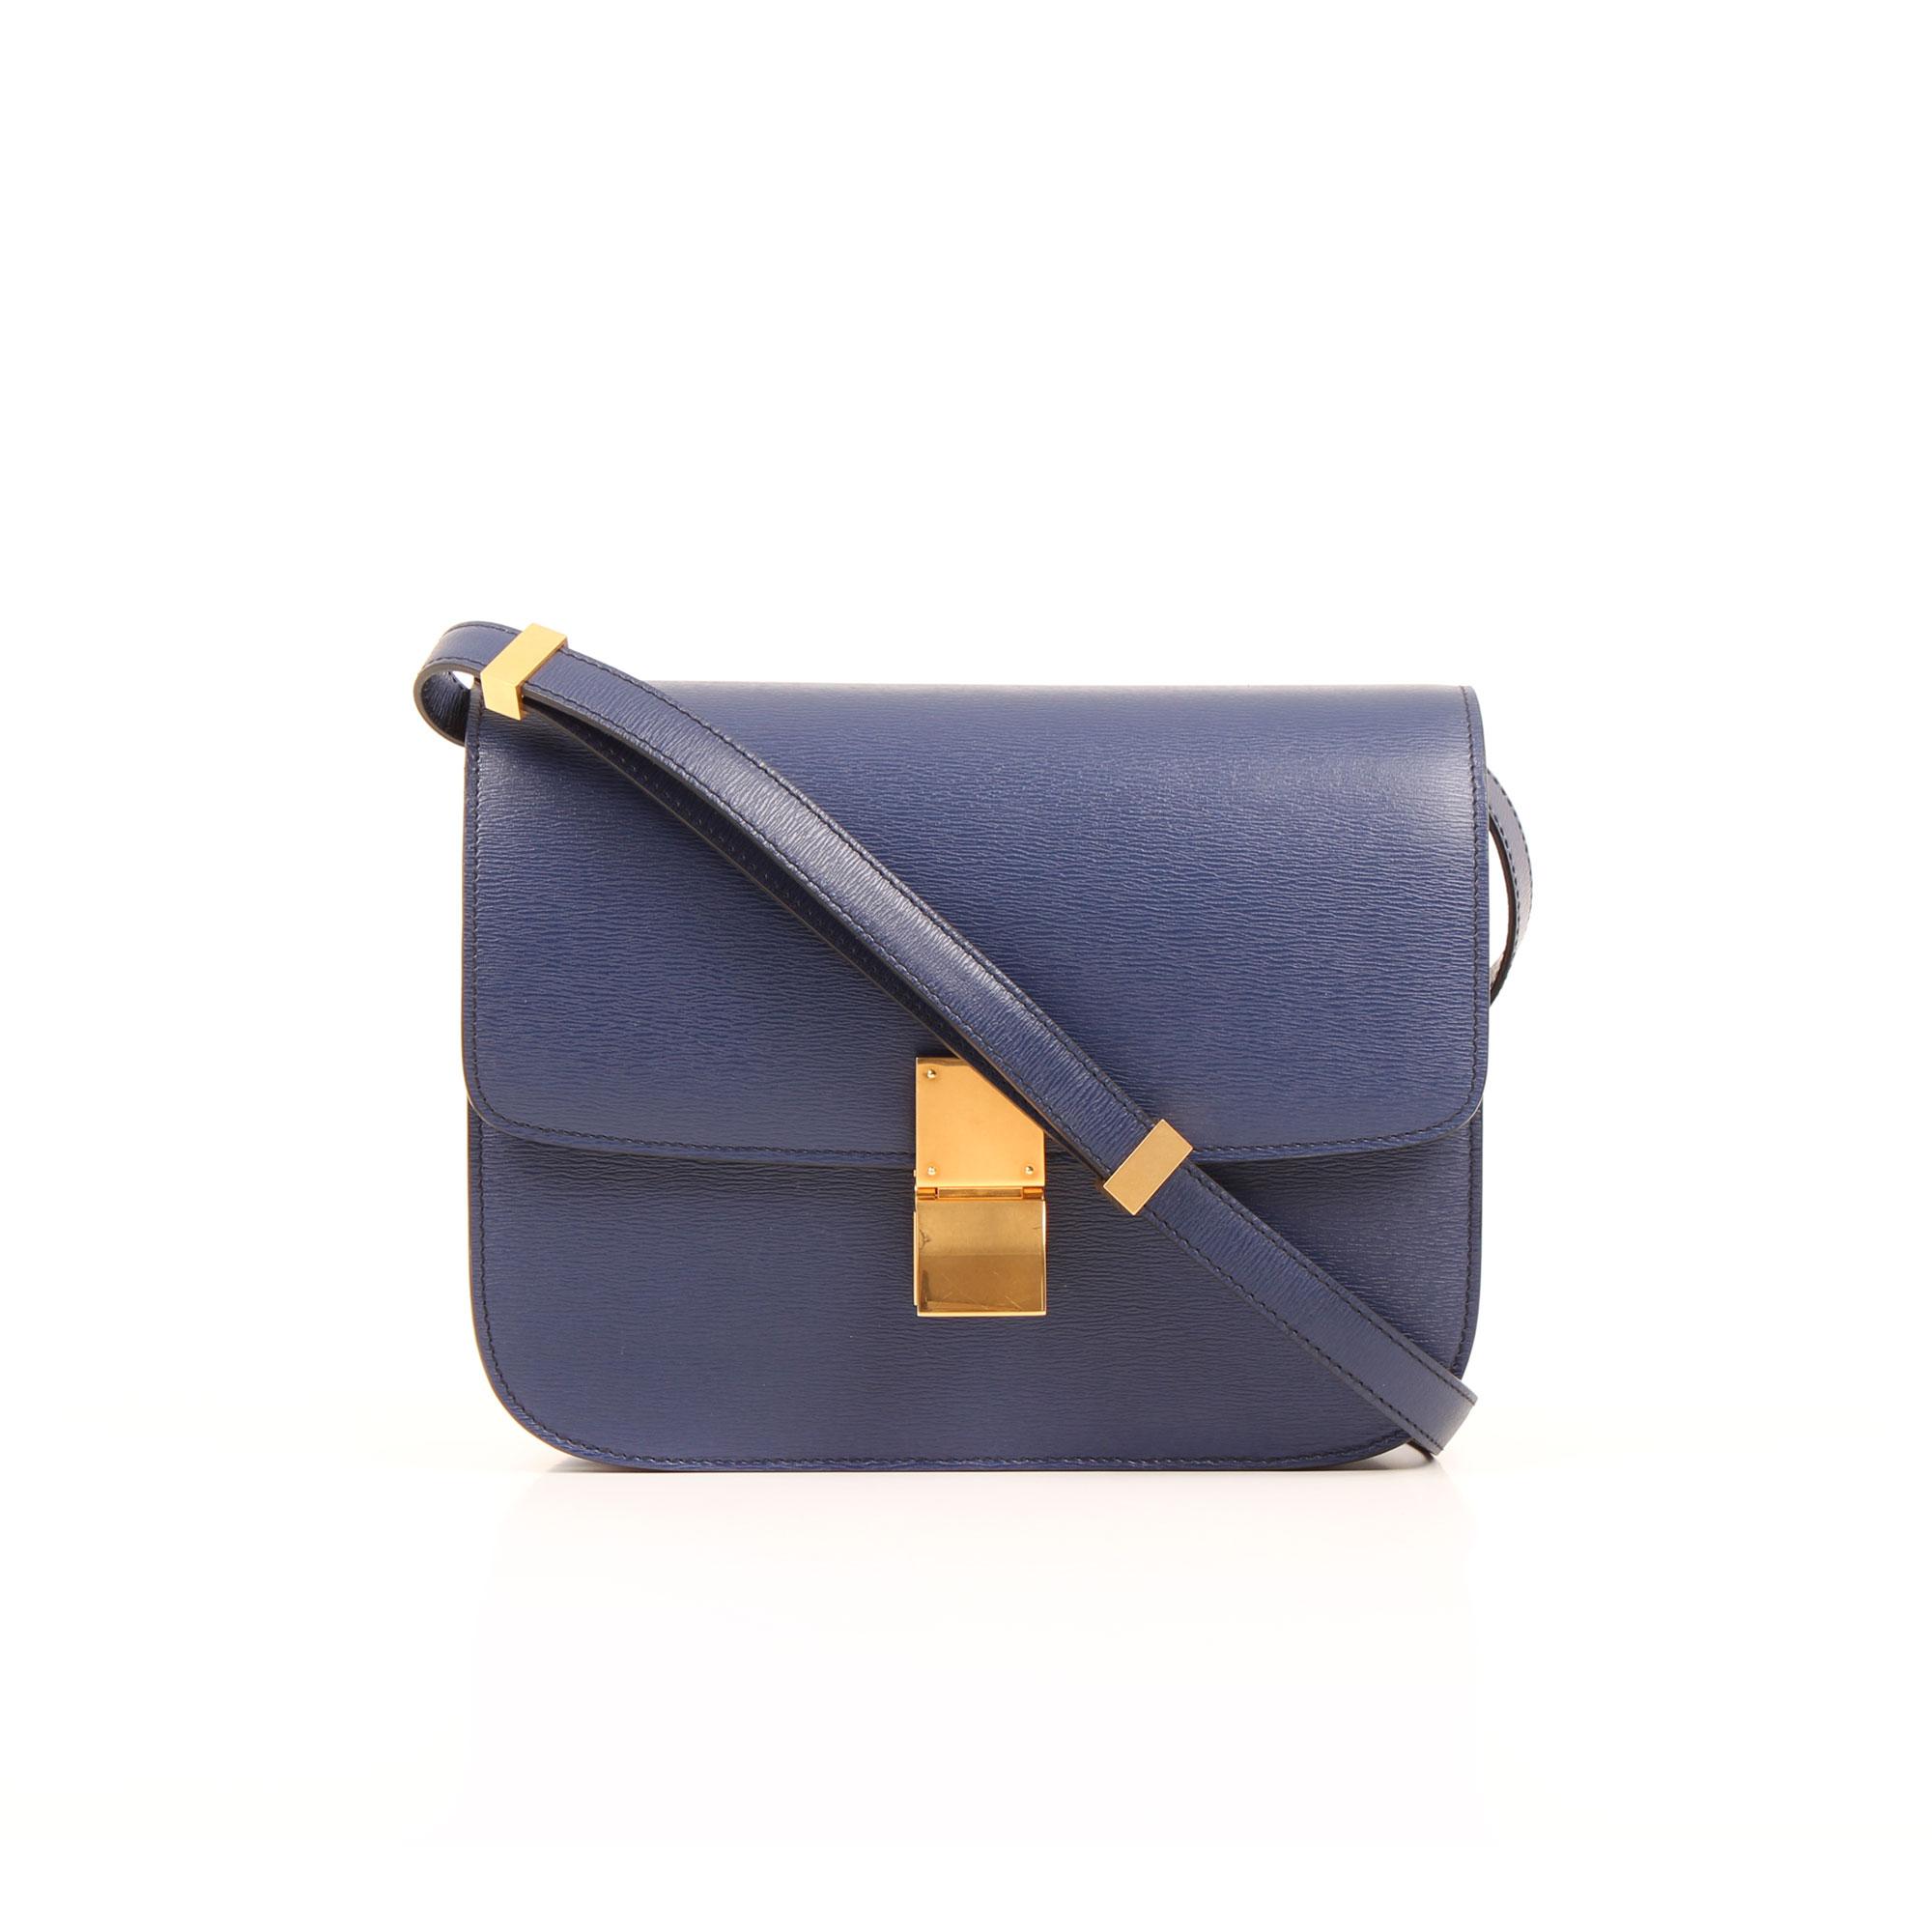 Imagen frontal del bolso celine box bag azul